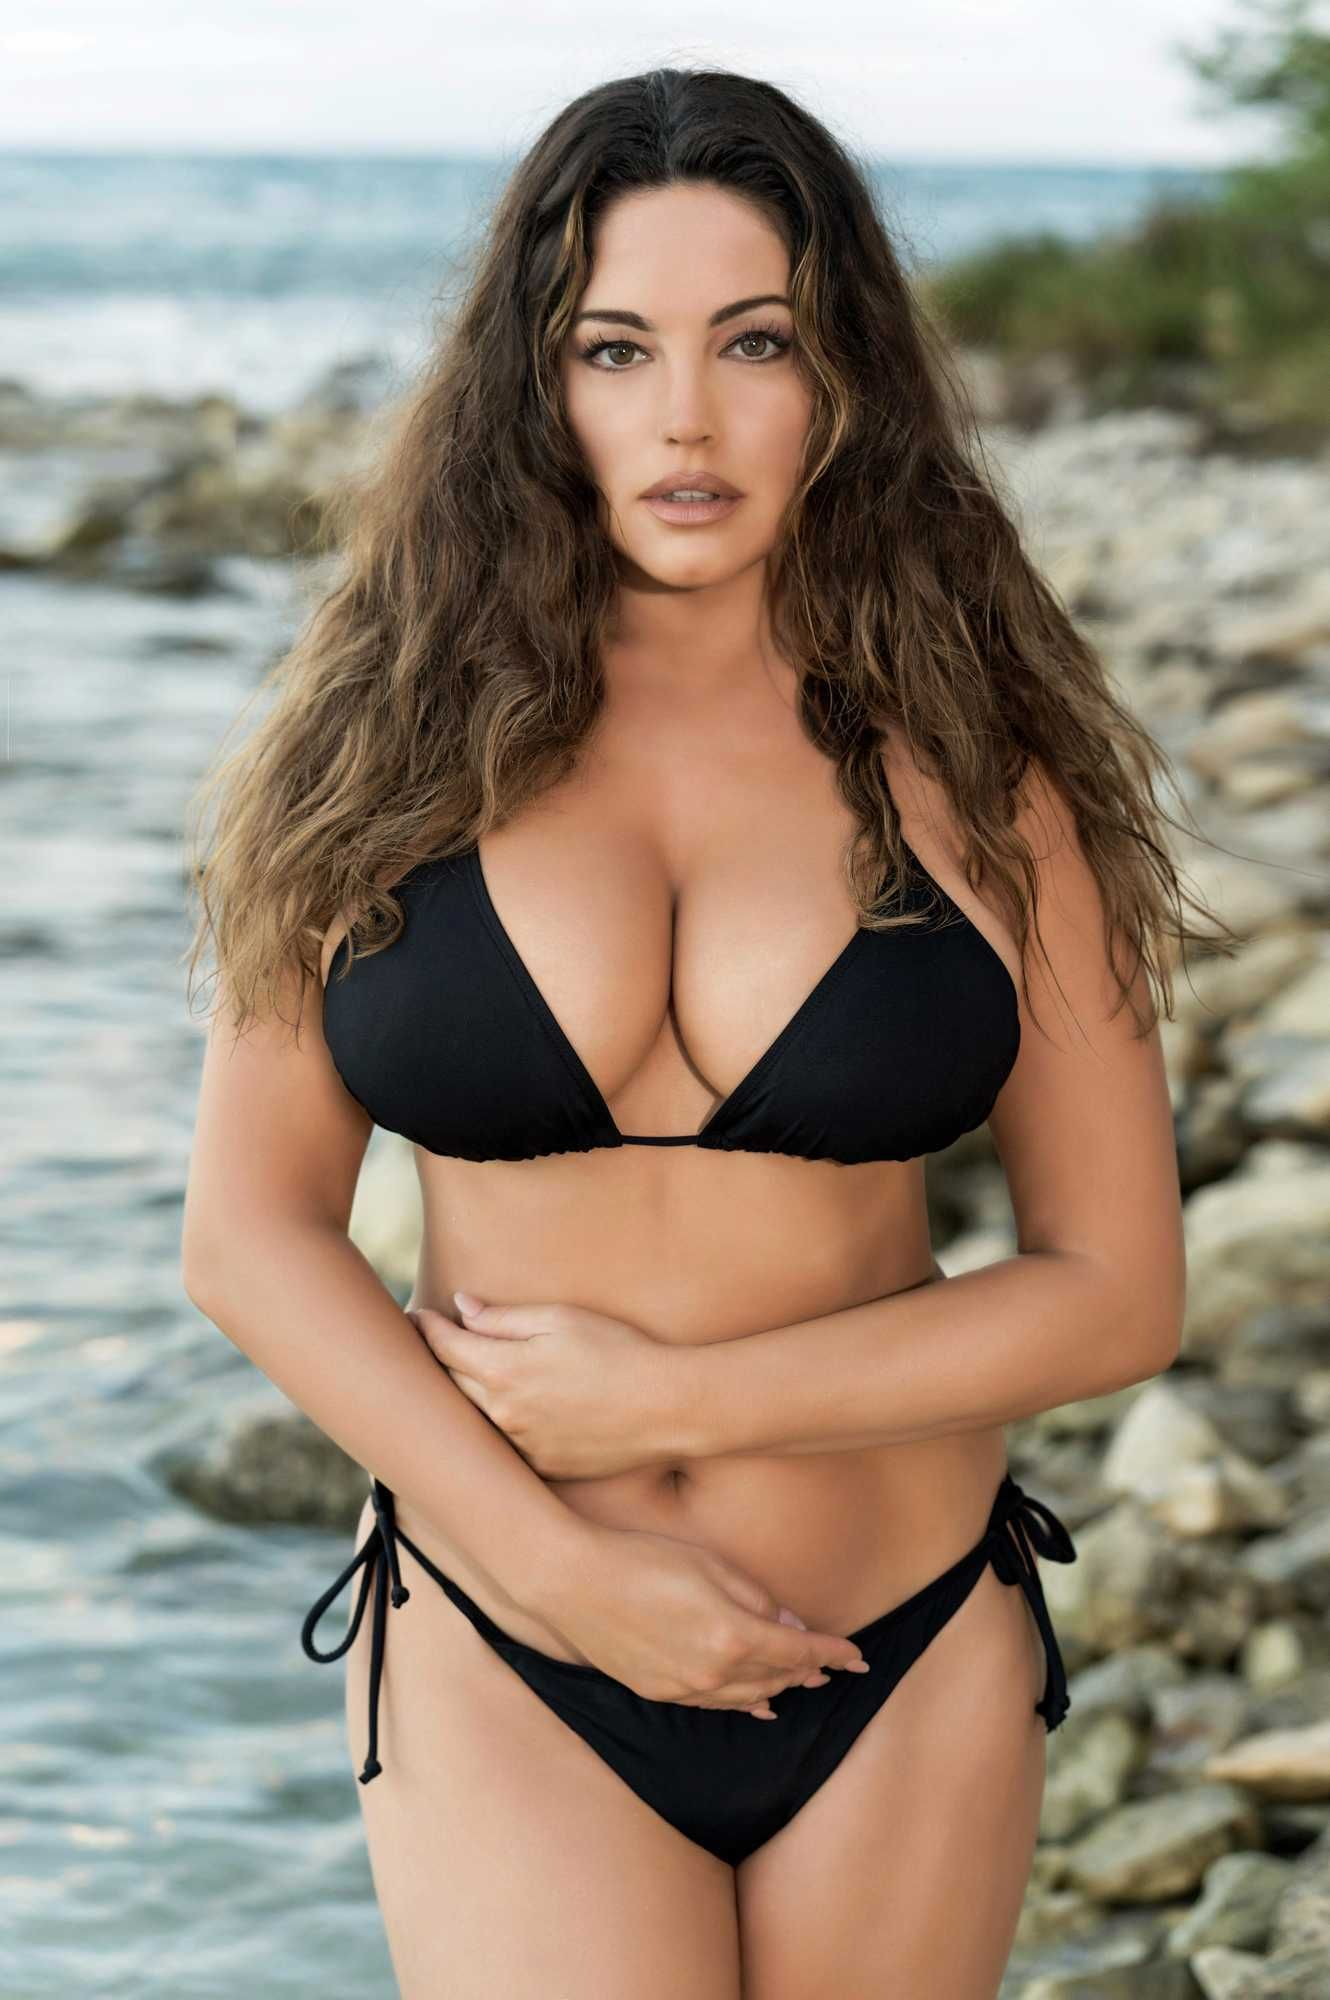 panties Bikini Julia Kovalchuk naked photo 2017